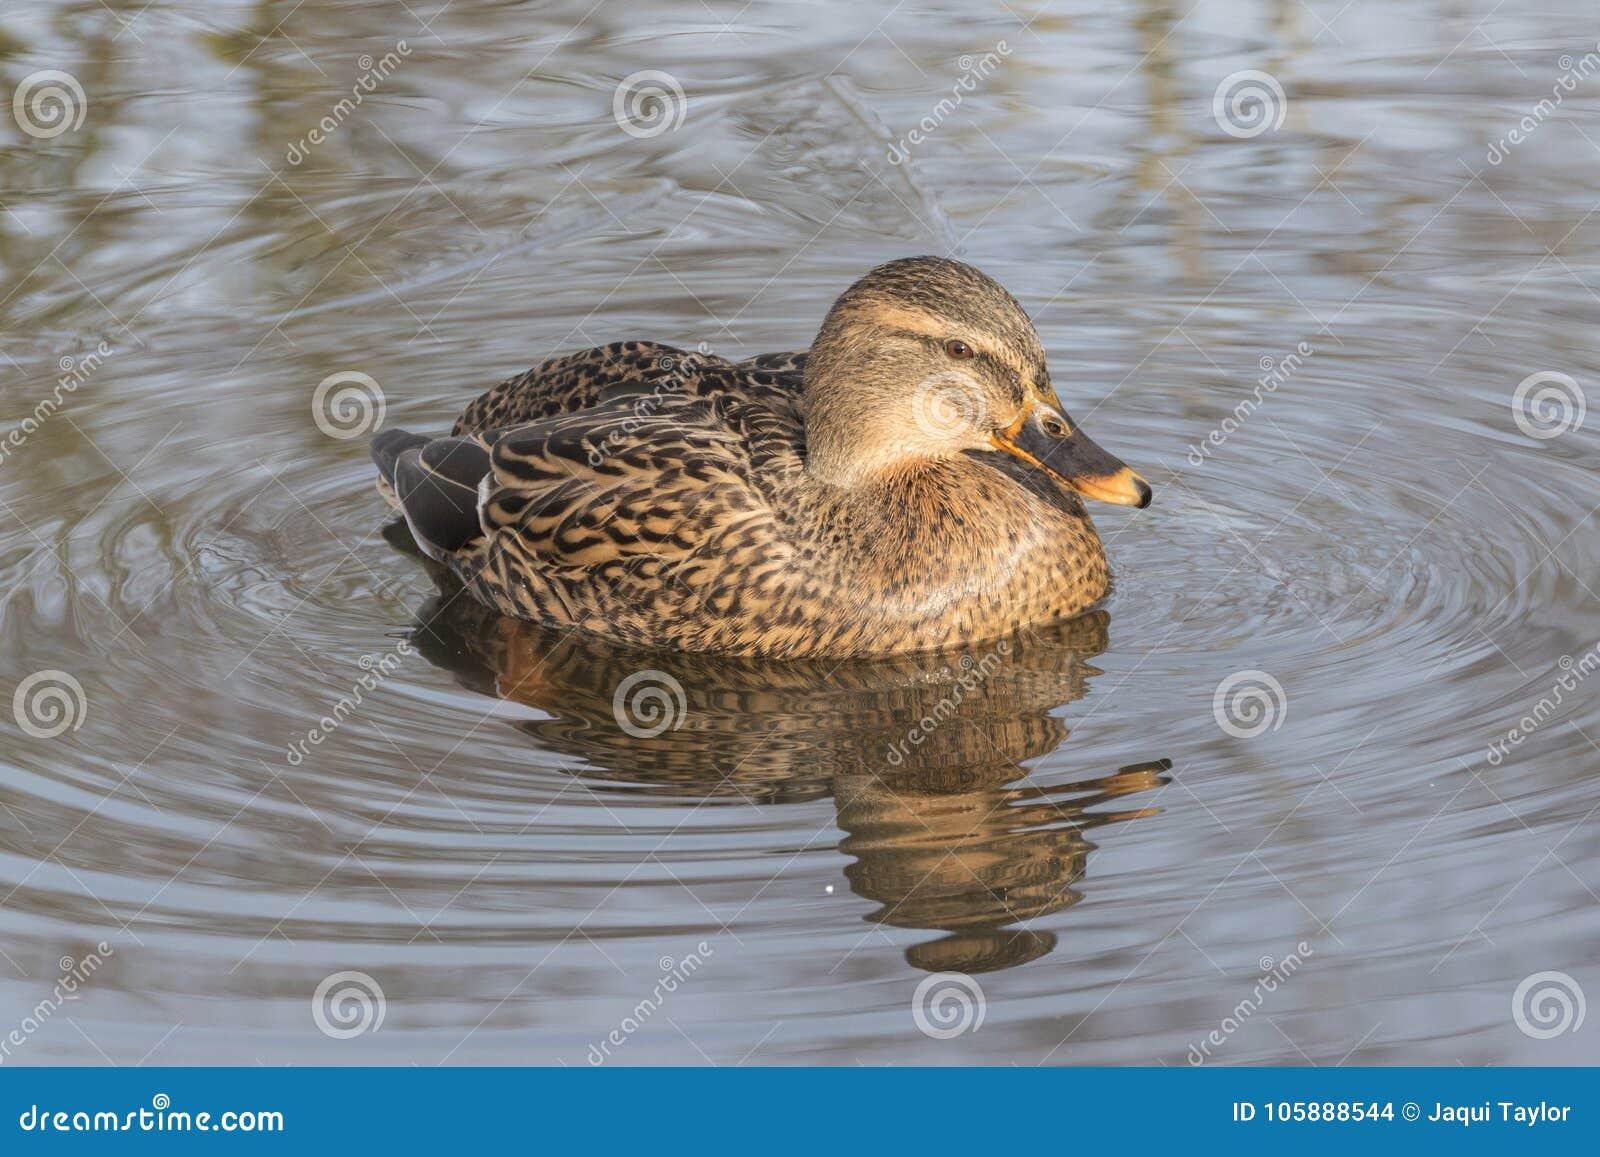 A mallard duck on an icy pond